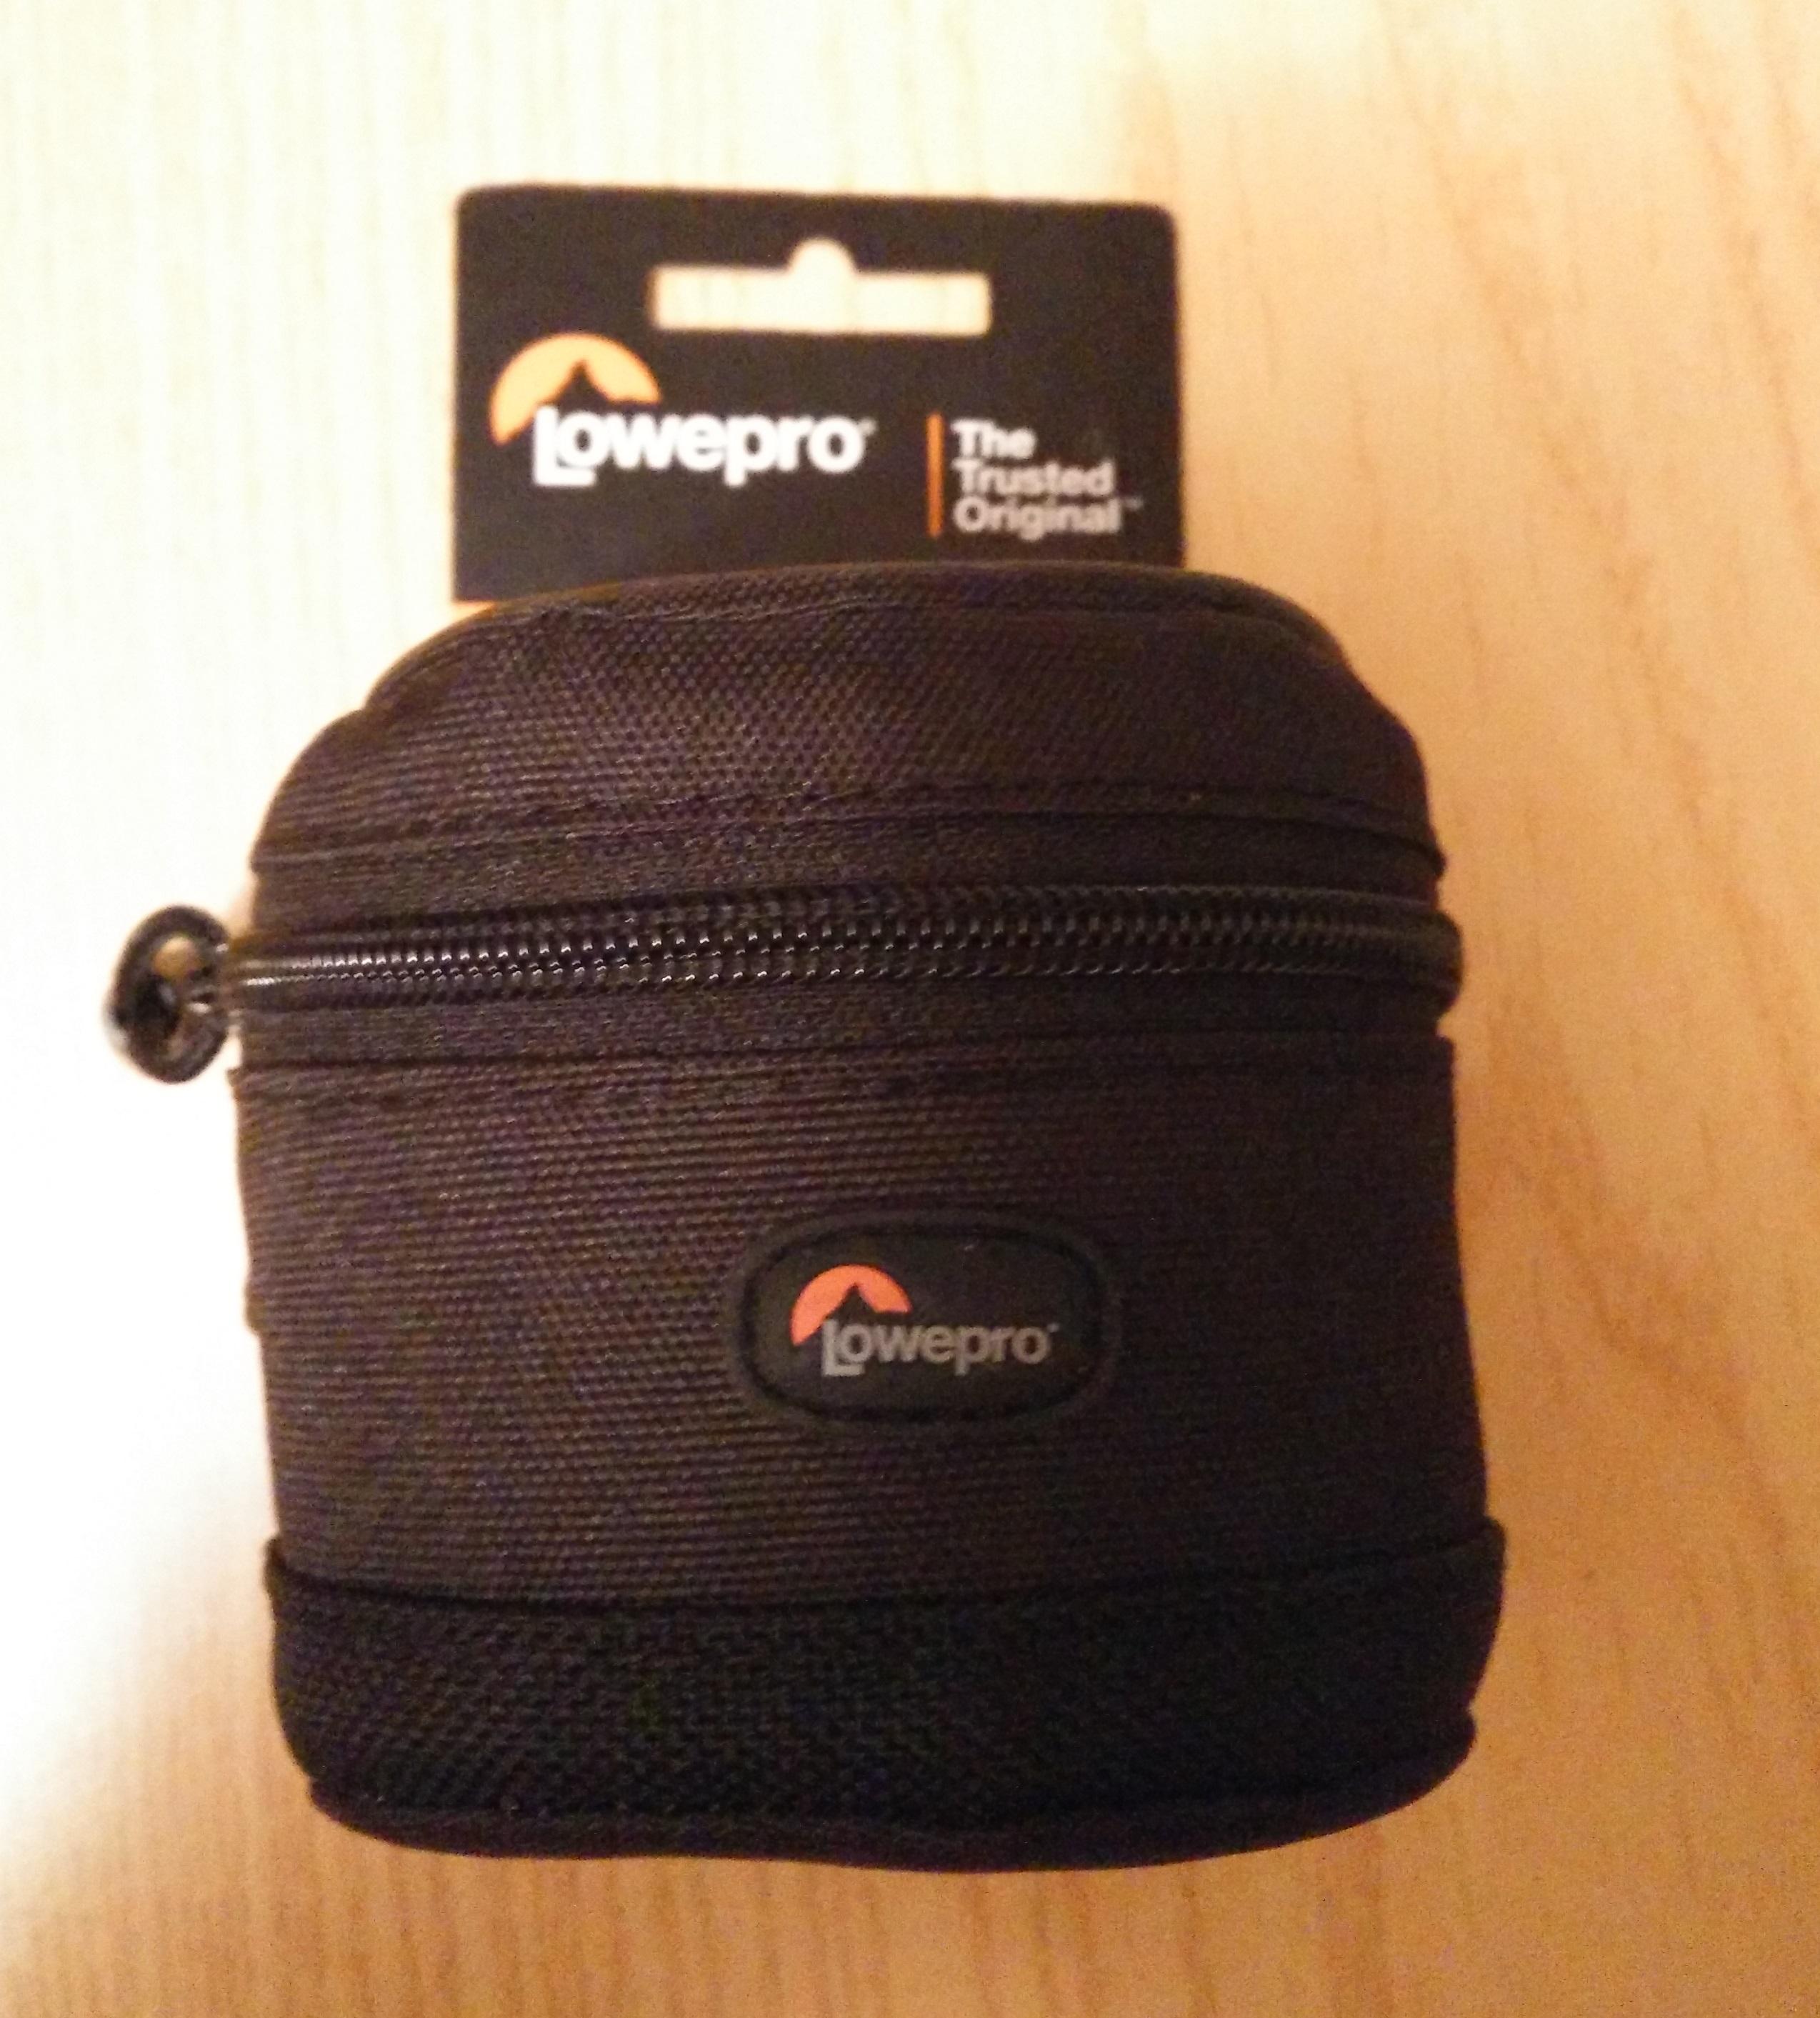 Bolsa de transporte Lowepro para cámaras VidePan